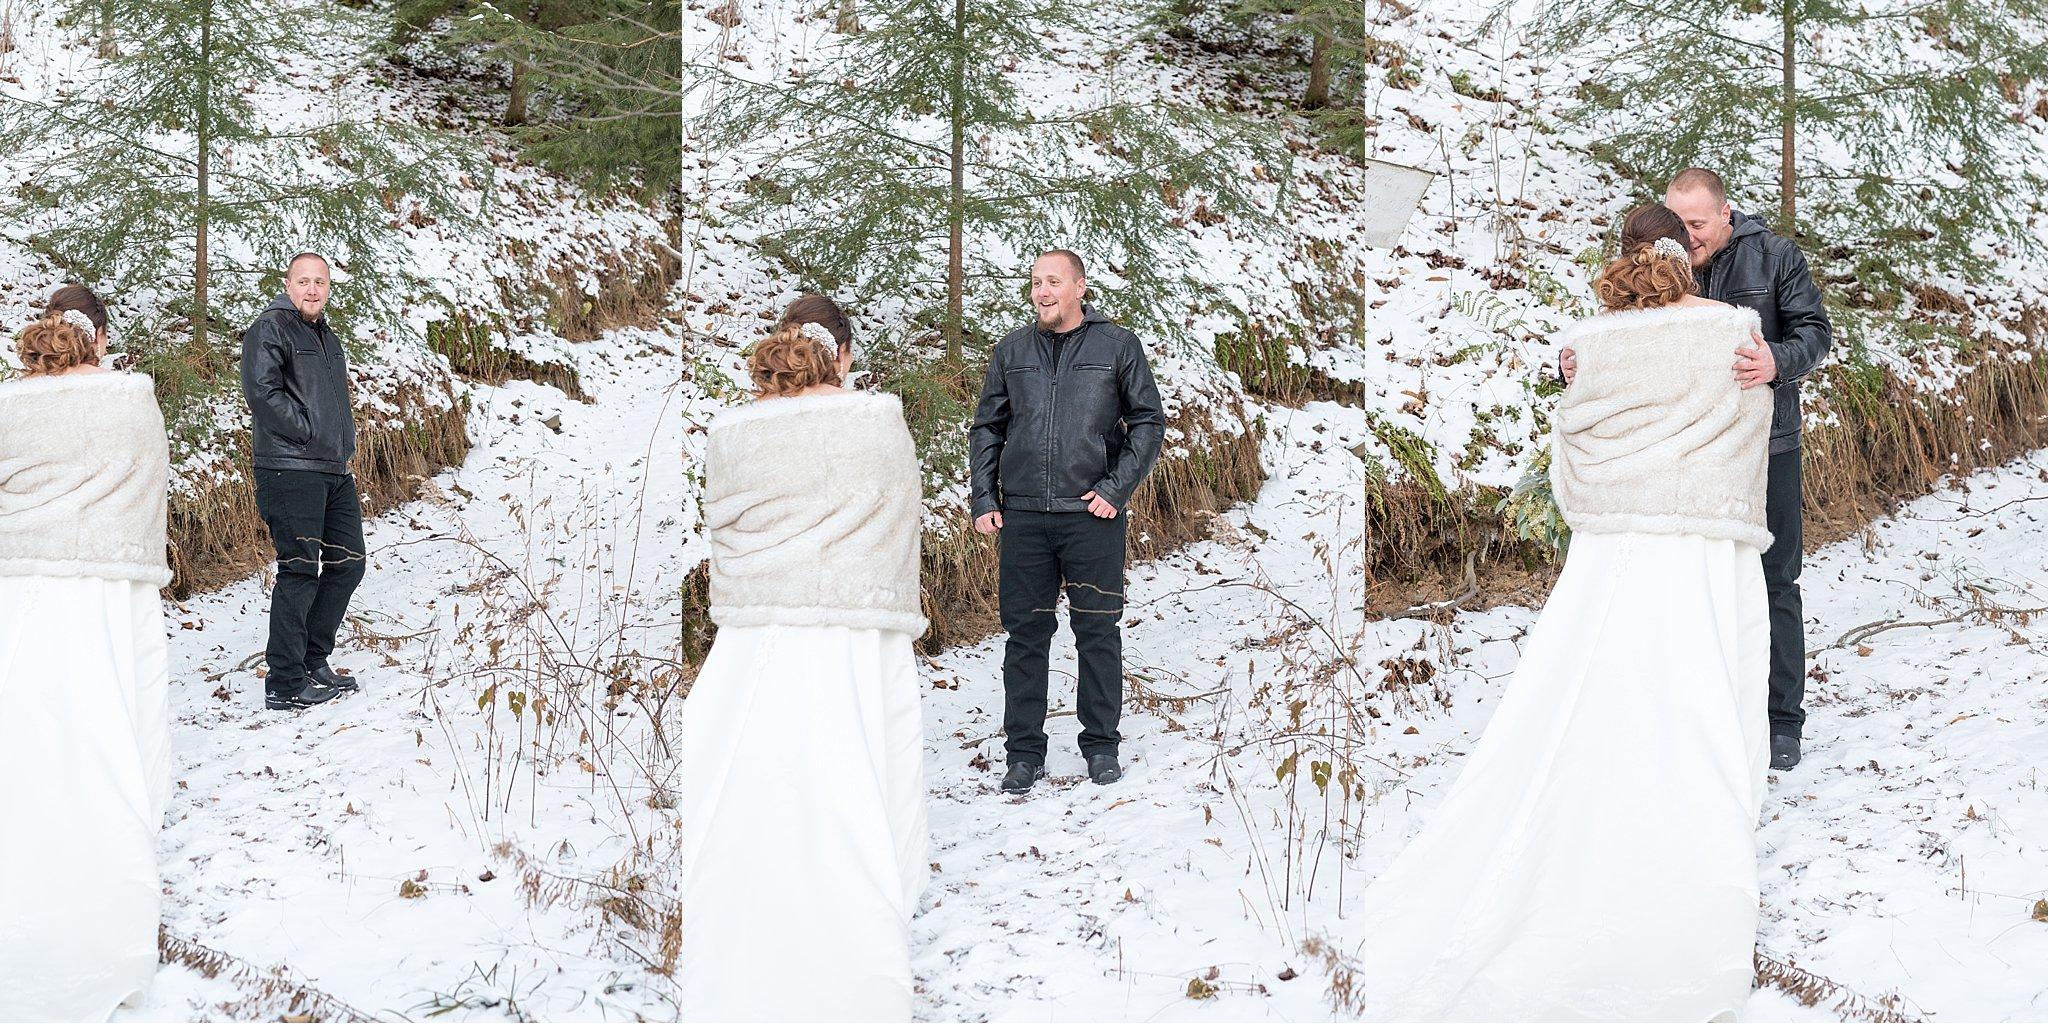 Winter elopemen snow covered vow exchange Coudersport PA photo_0586.jpg